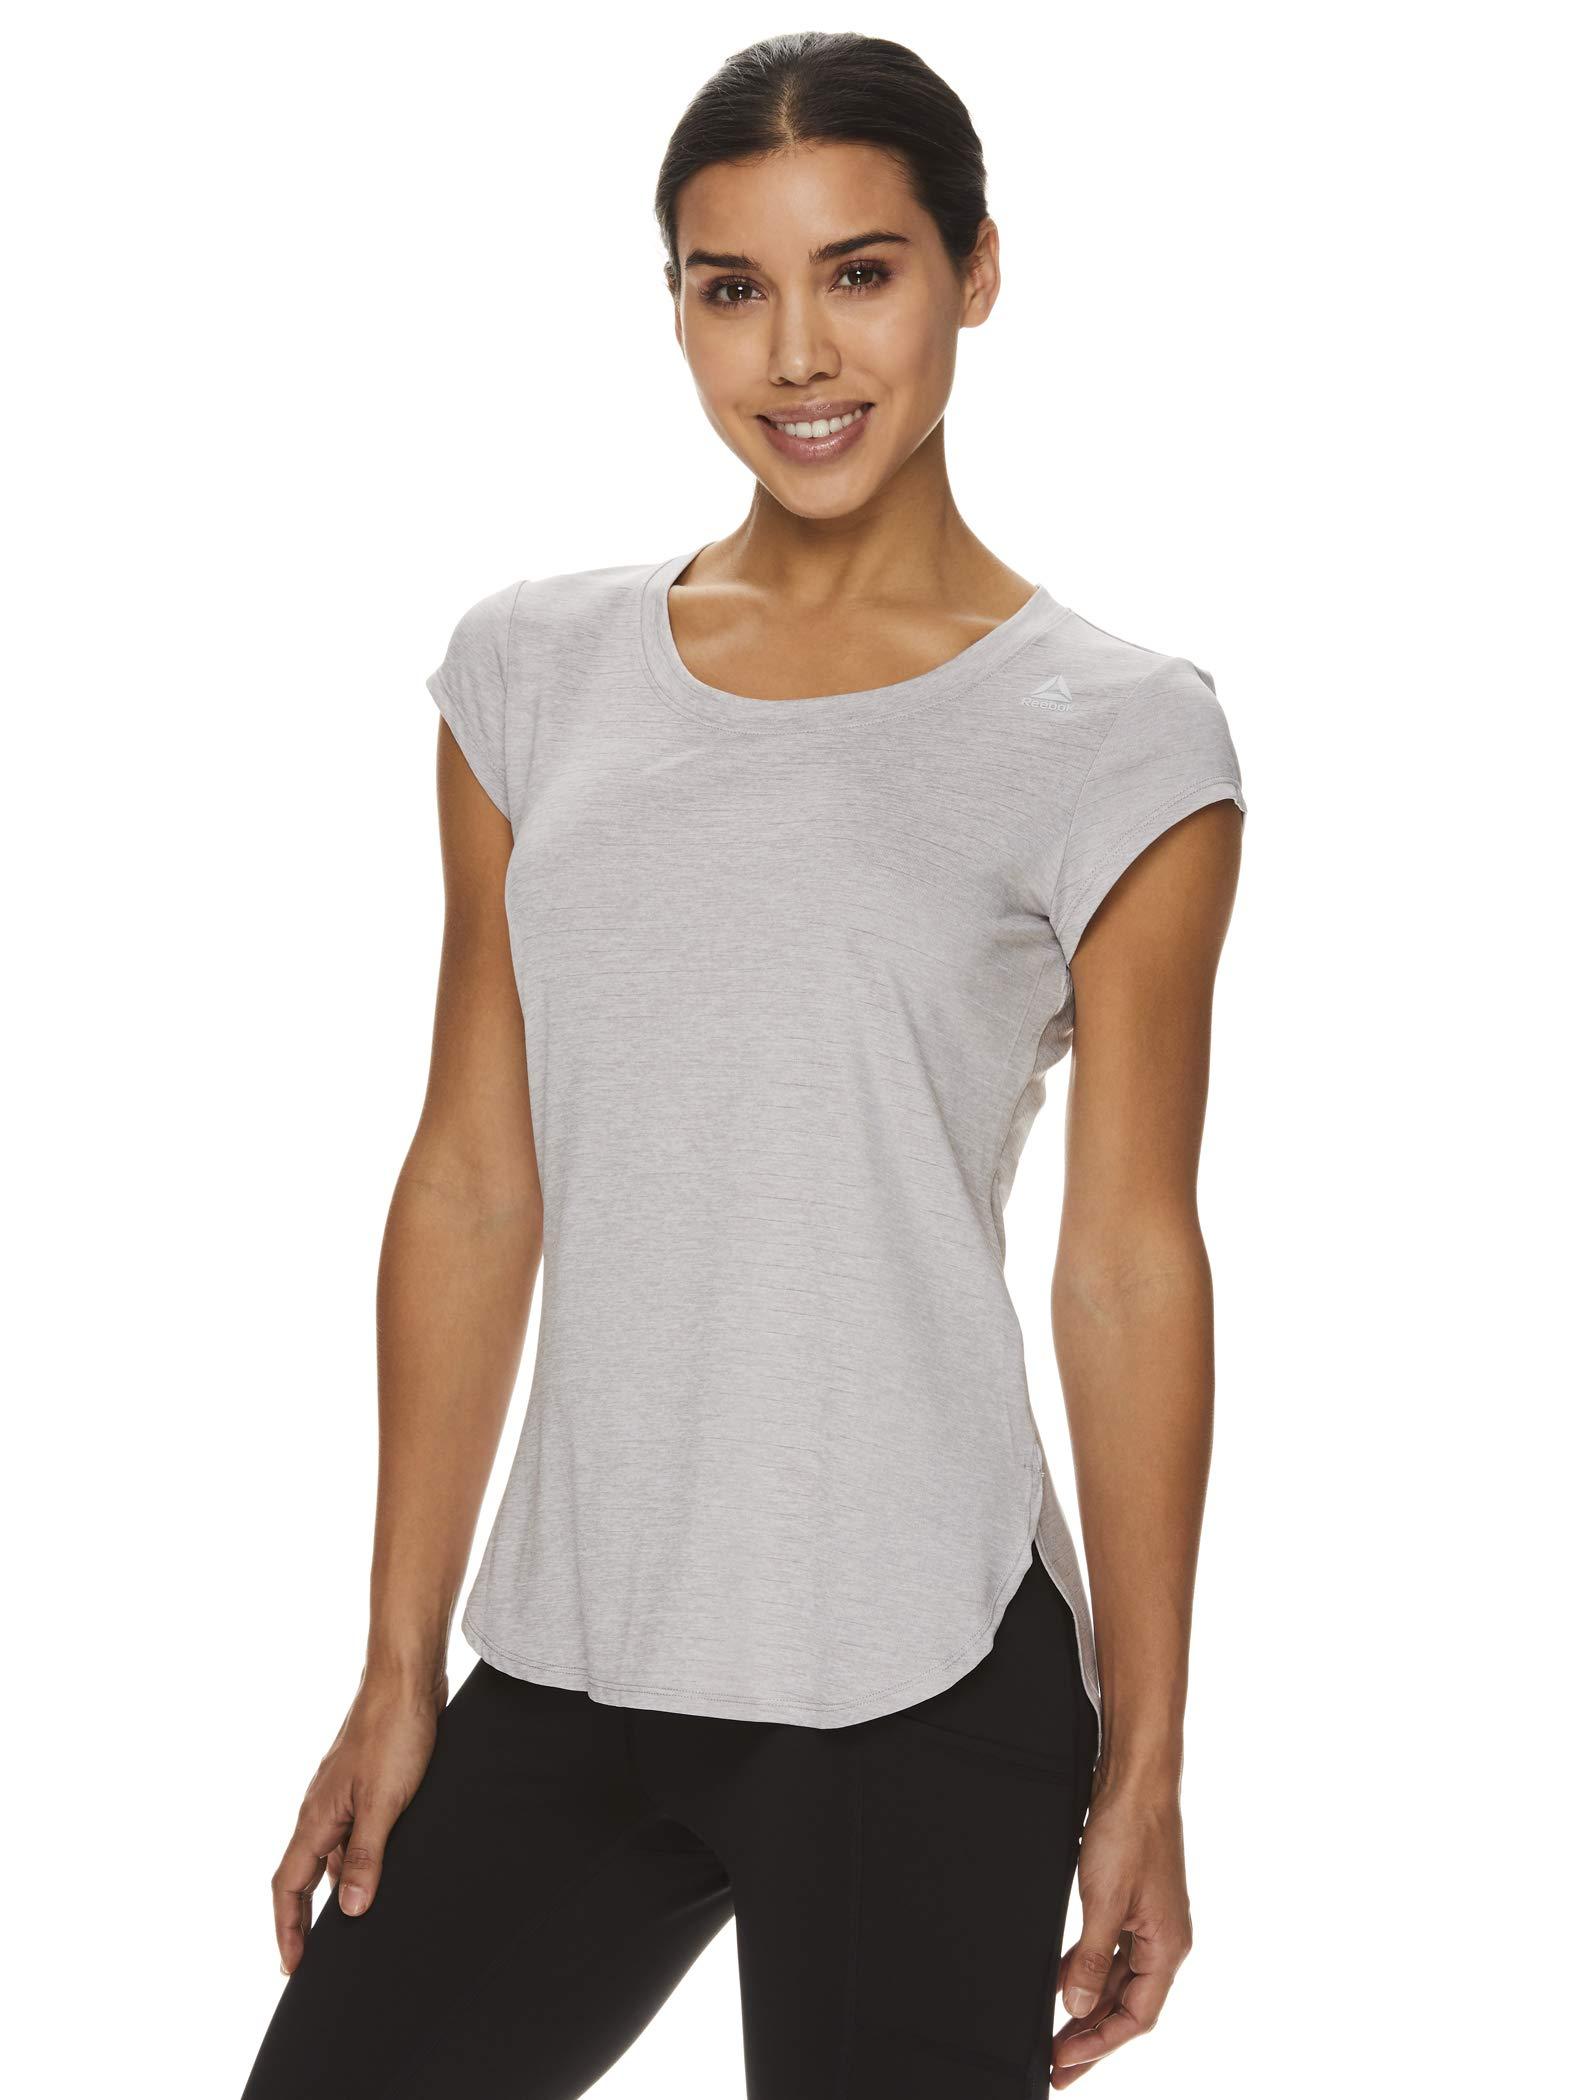 Reebok Women's Legend Running & Gym T-Shirt - Performance Short Sleeve Workout Clothes for Women - Silver Sconce Heather Legend Grey, Small by Reebok